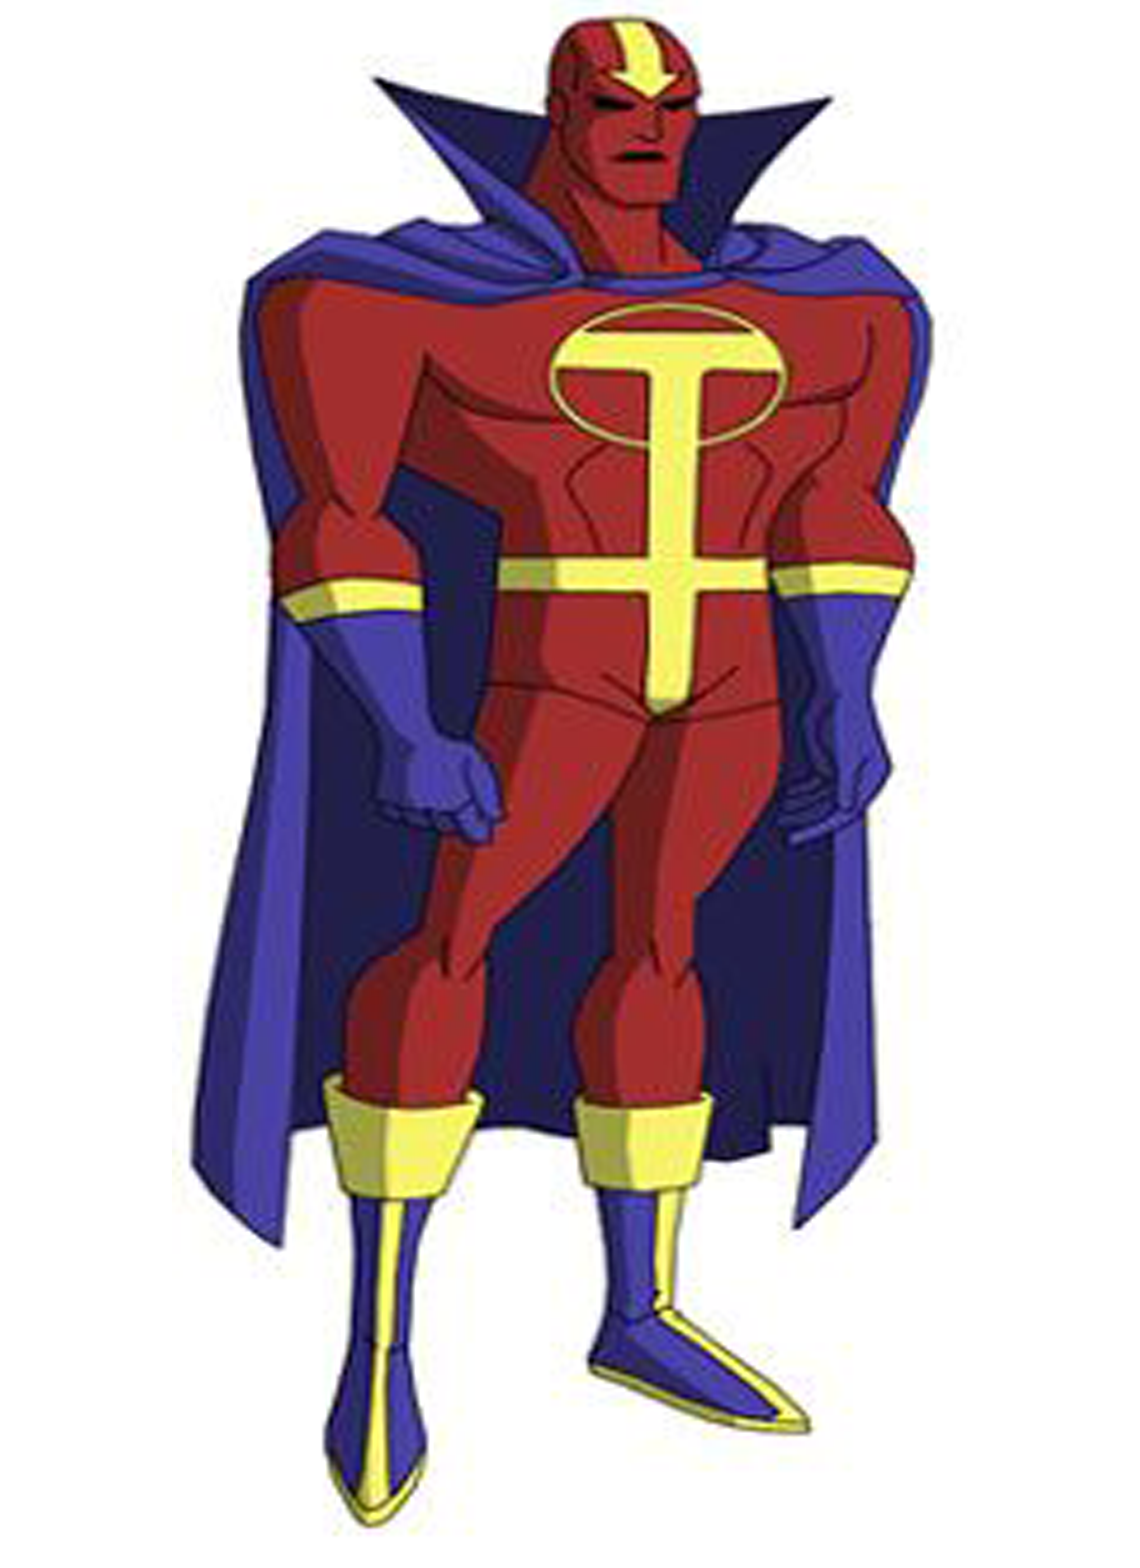 Pin by Billy Kaahanui on Characters   Dc comics, Dc comics ... - Red X DC Art